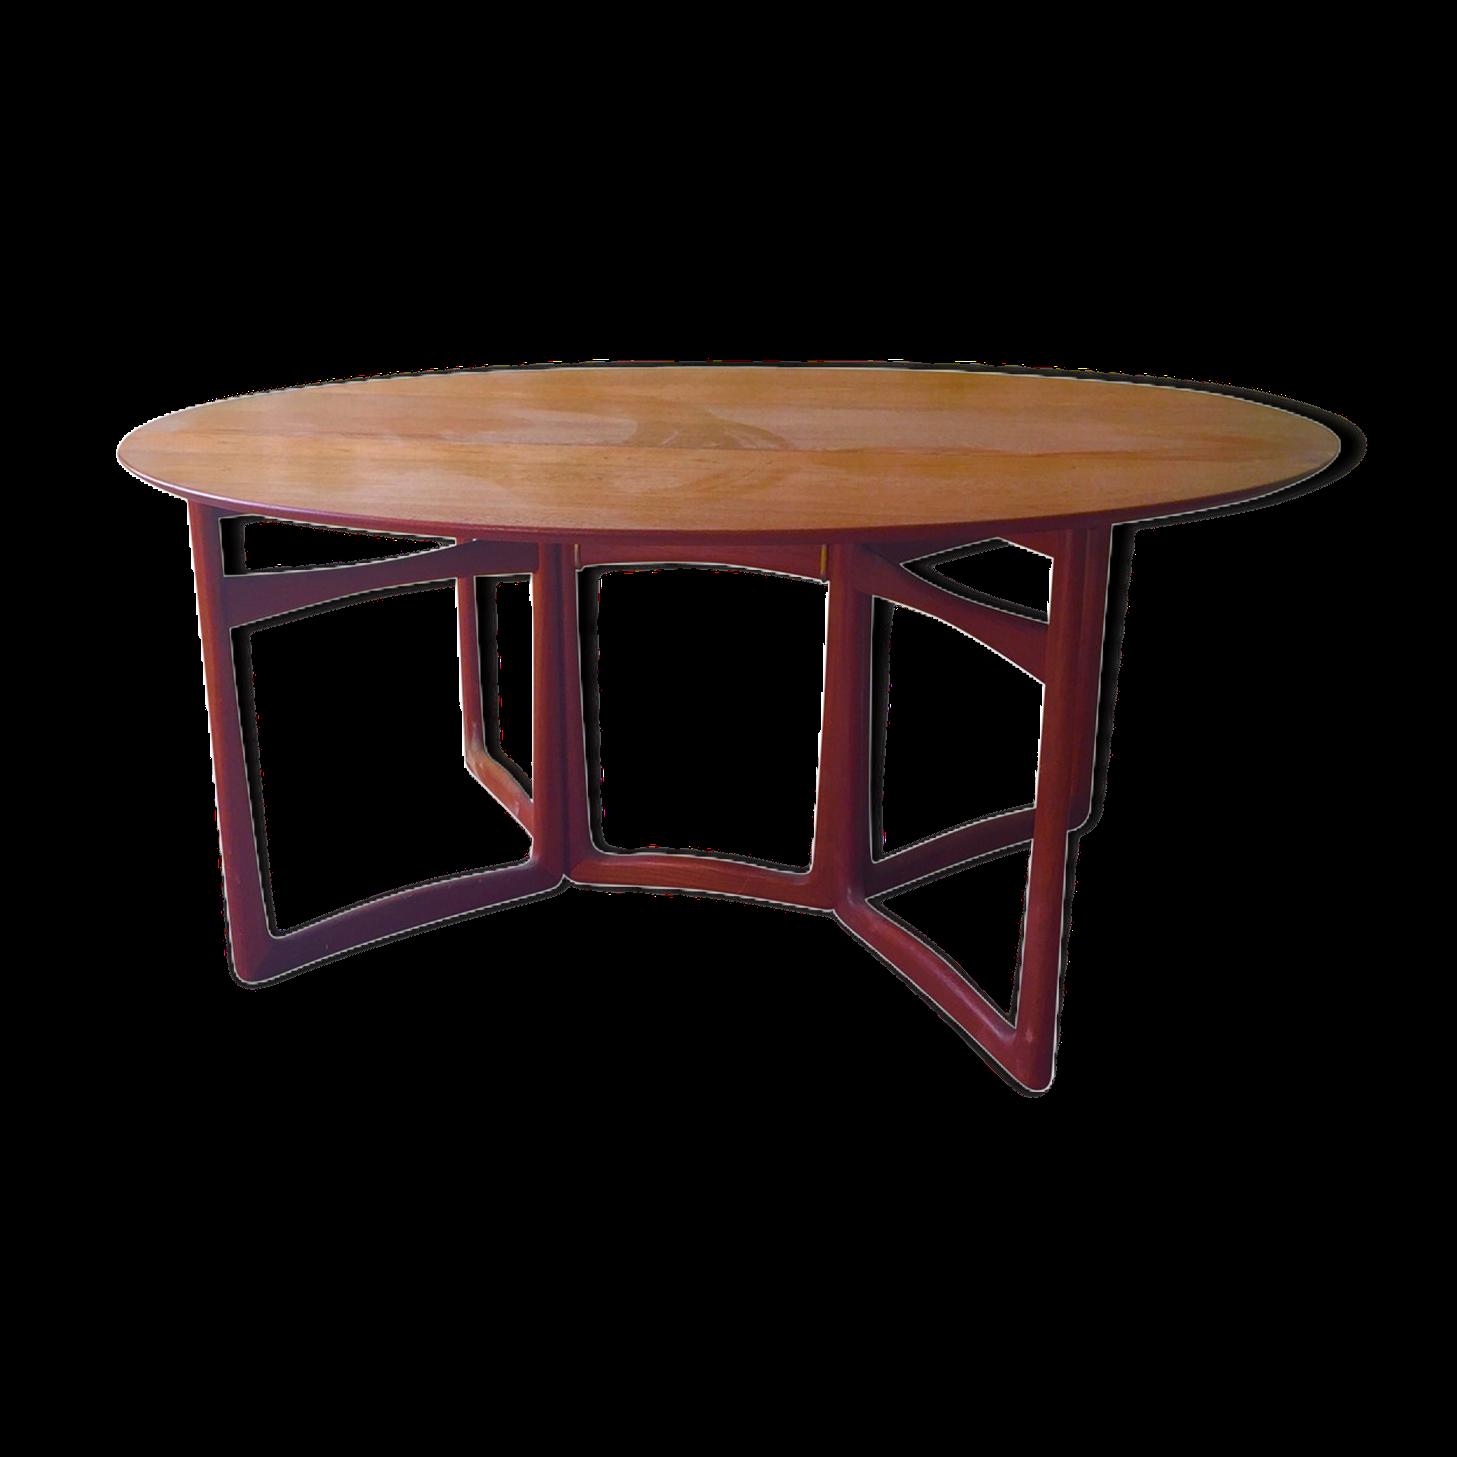 Table salle a manger avec rallonge intgre table de repas for Table salle a manger ronde avec rallonge